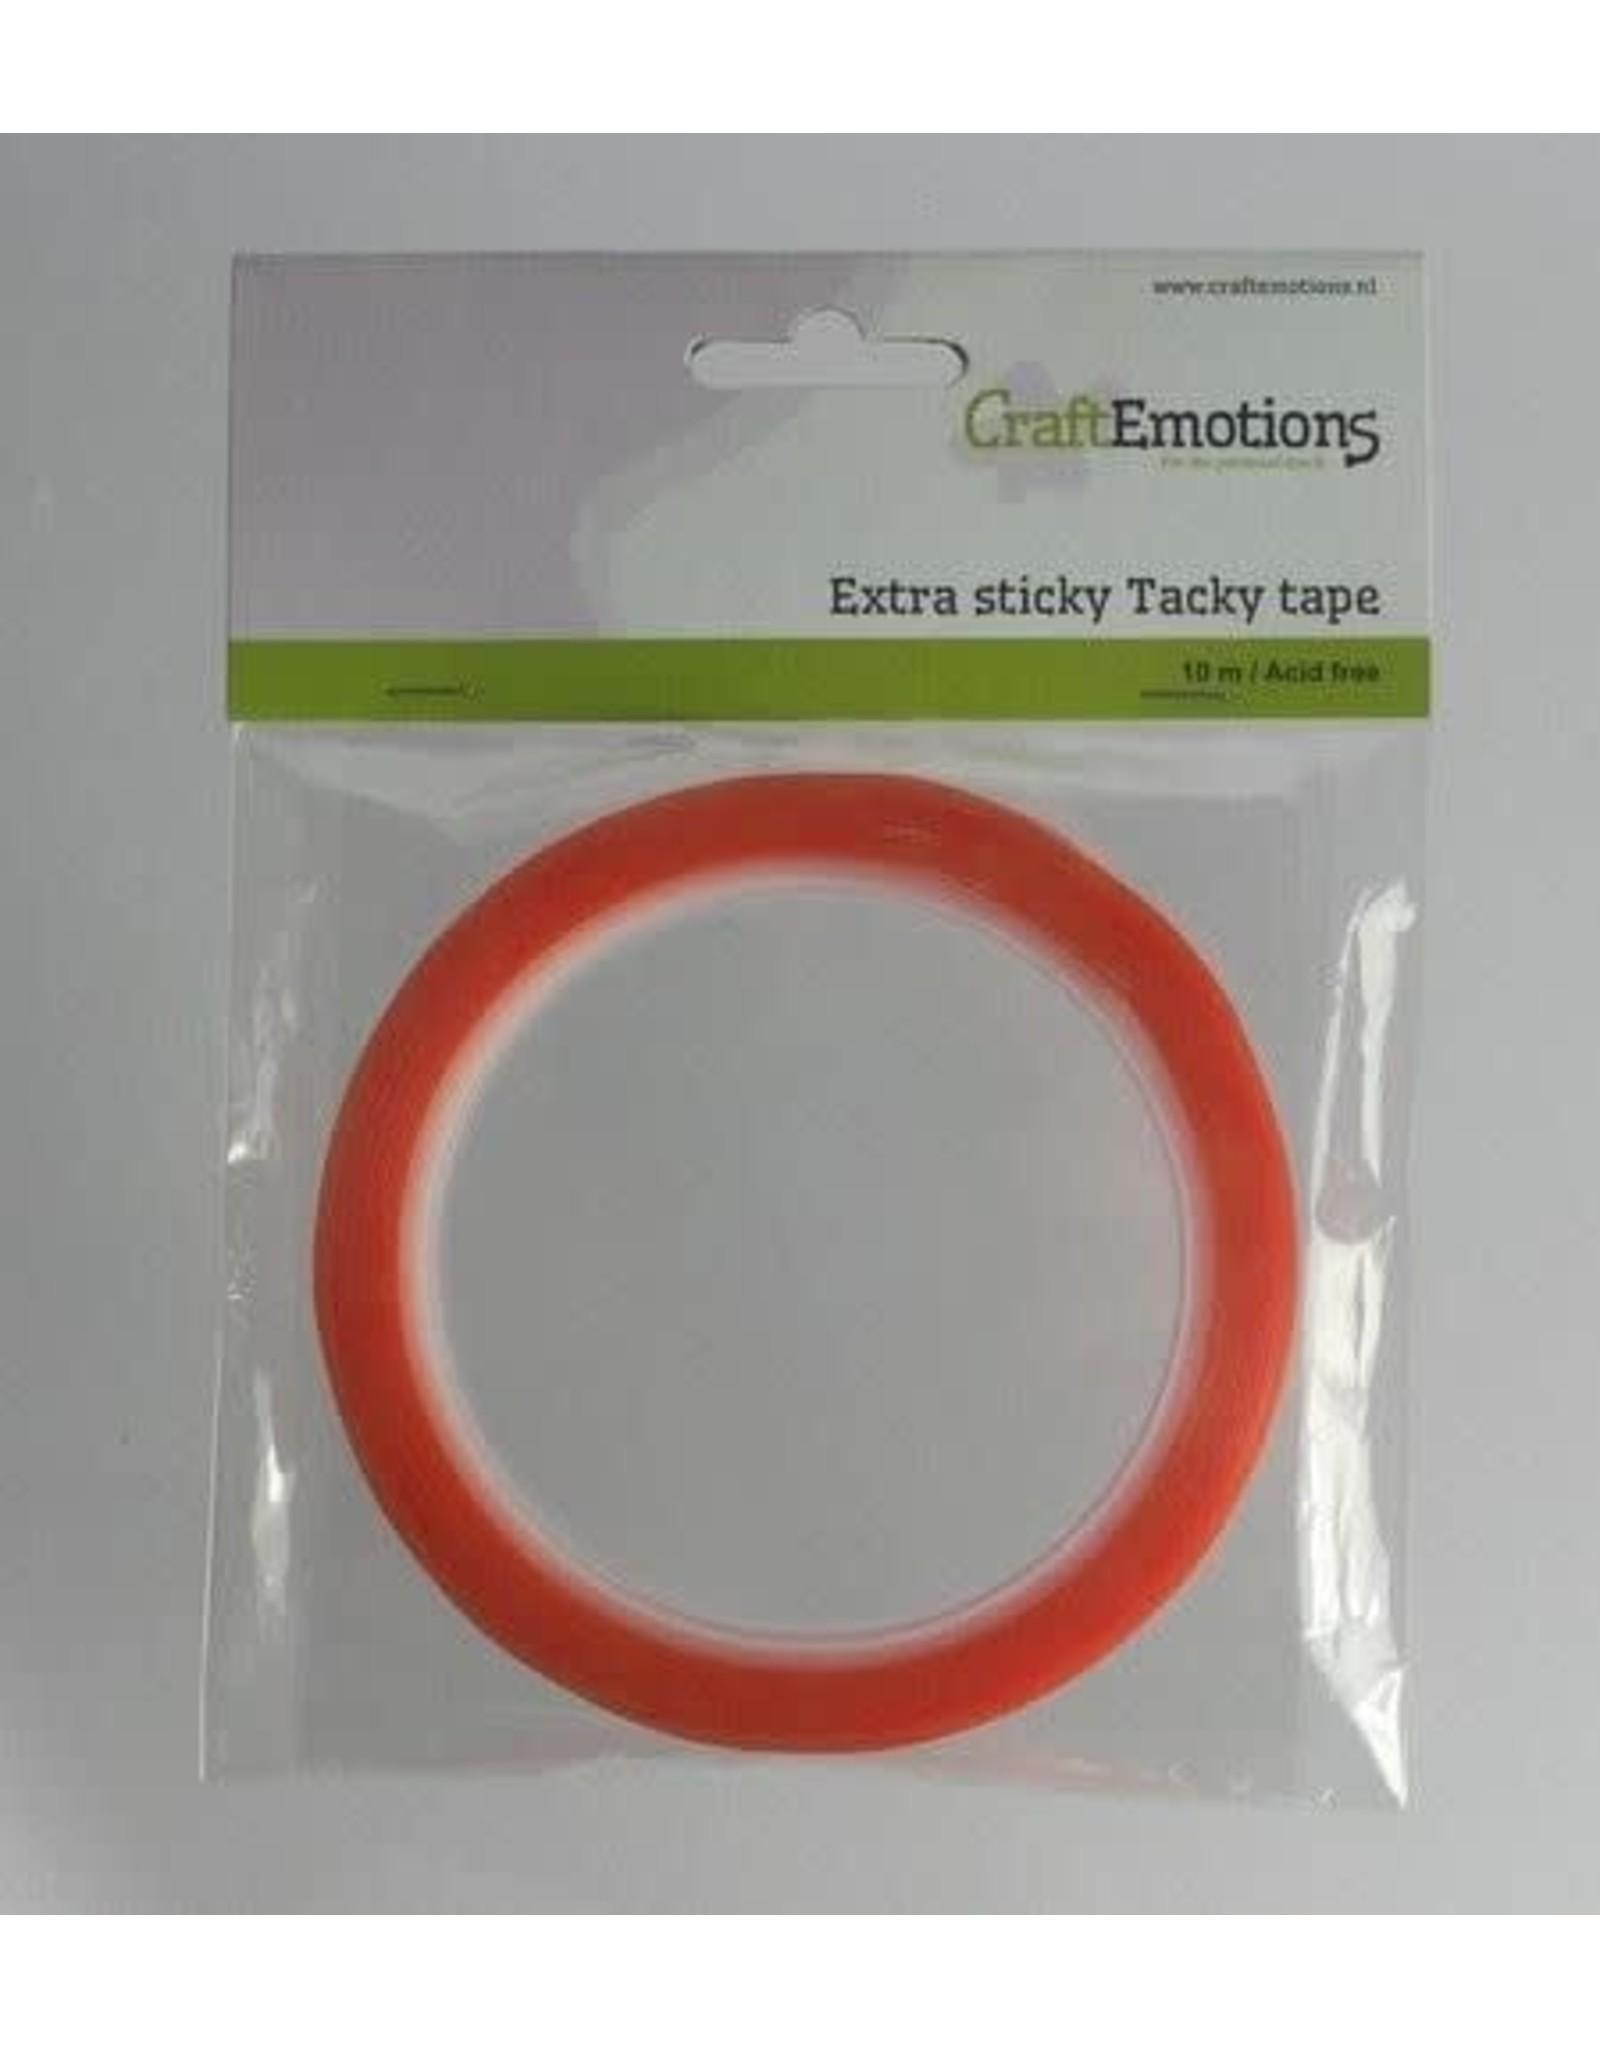 Craft Emotions CraftEmotions Extra sticky tape 12 mm 10 MT 1 RL